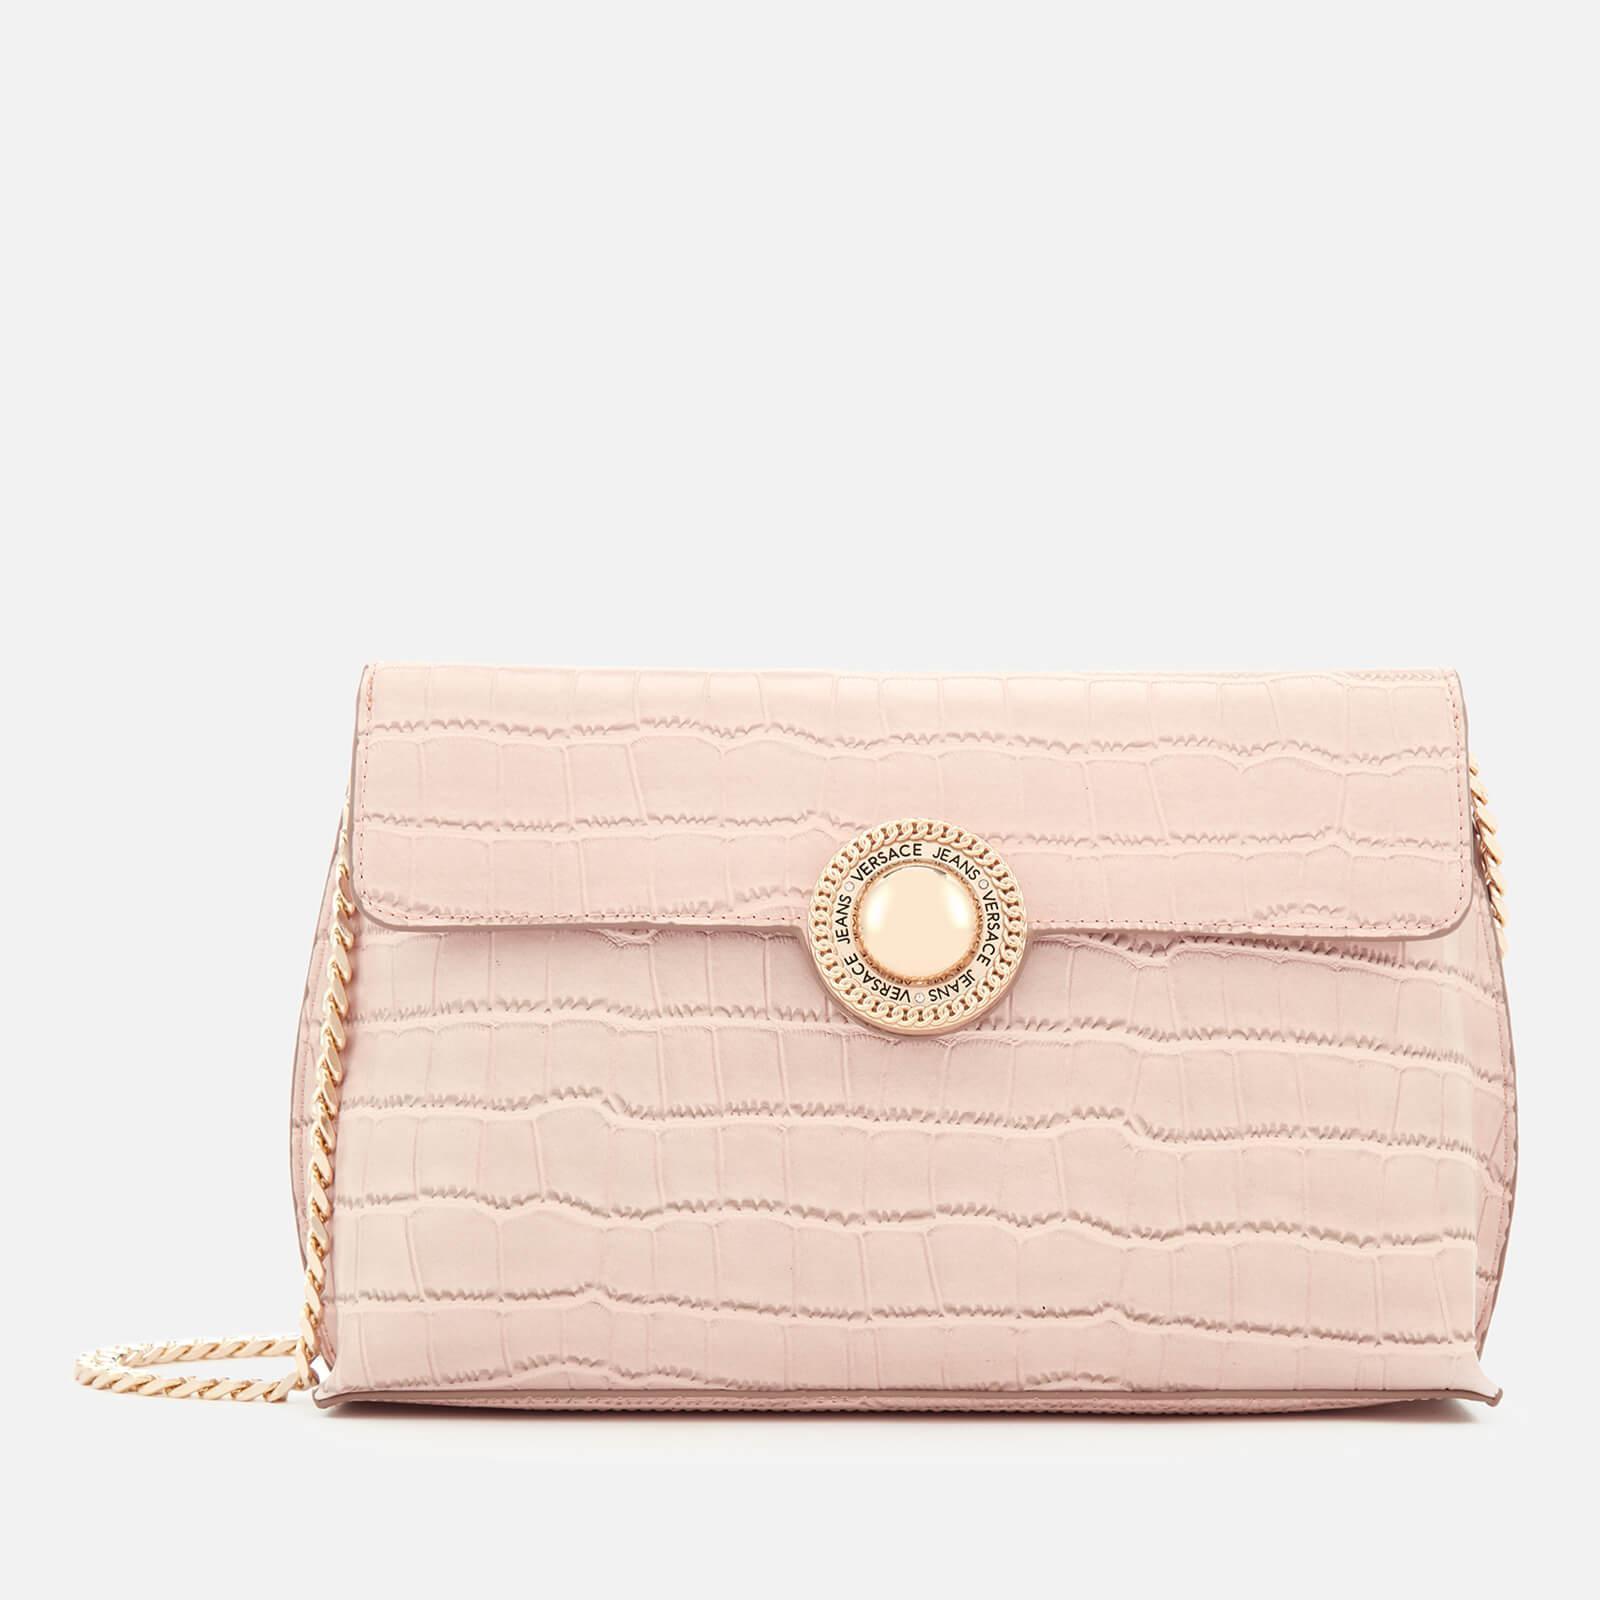 Lyst - Versace Jeans Croc Print Shoulder Bag in Pink 4c2d1beb7785d